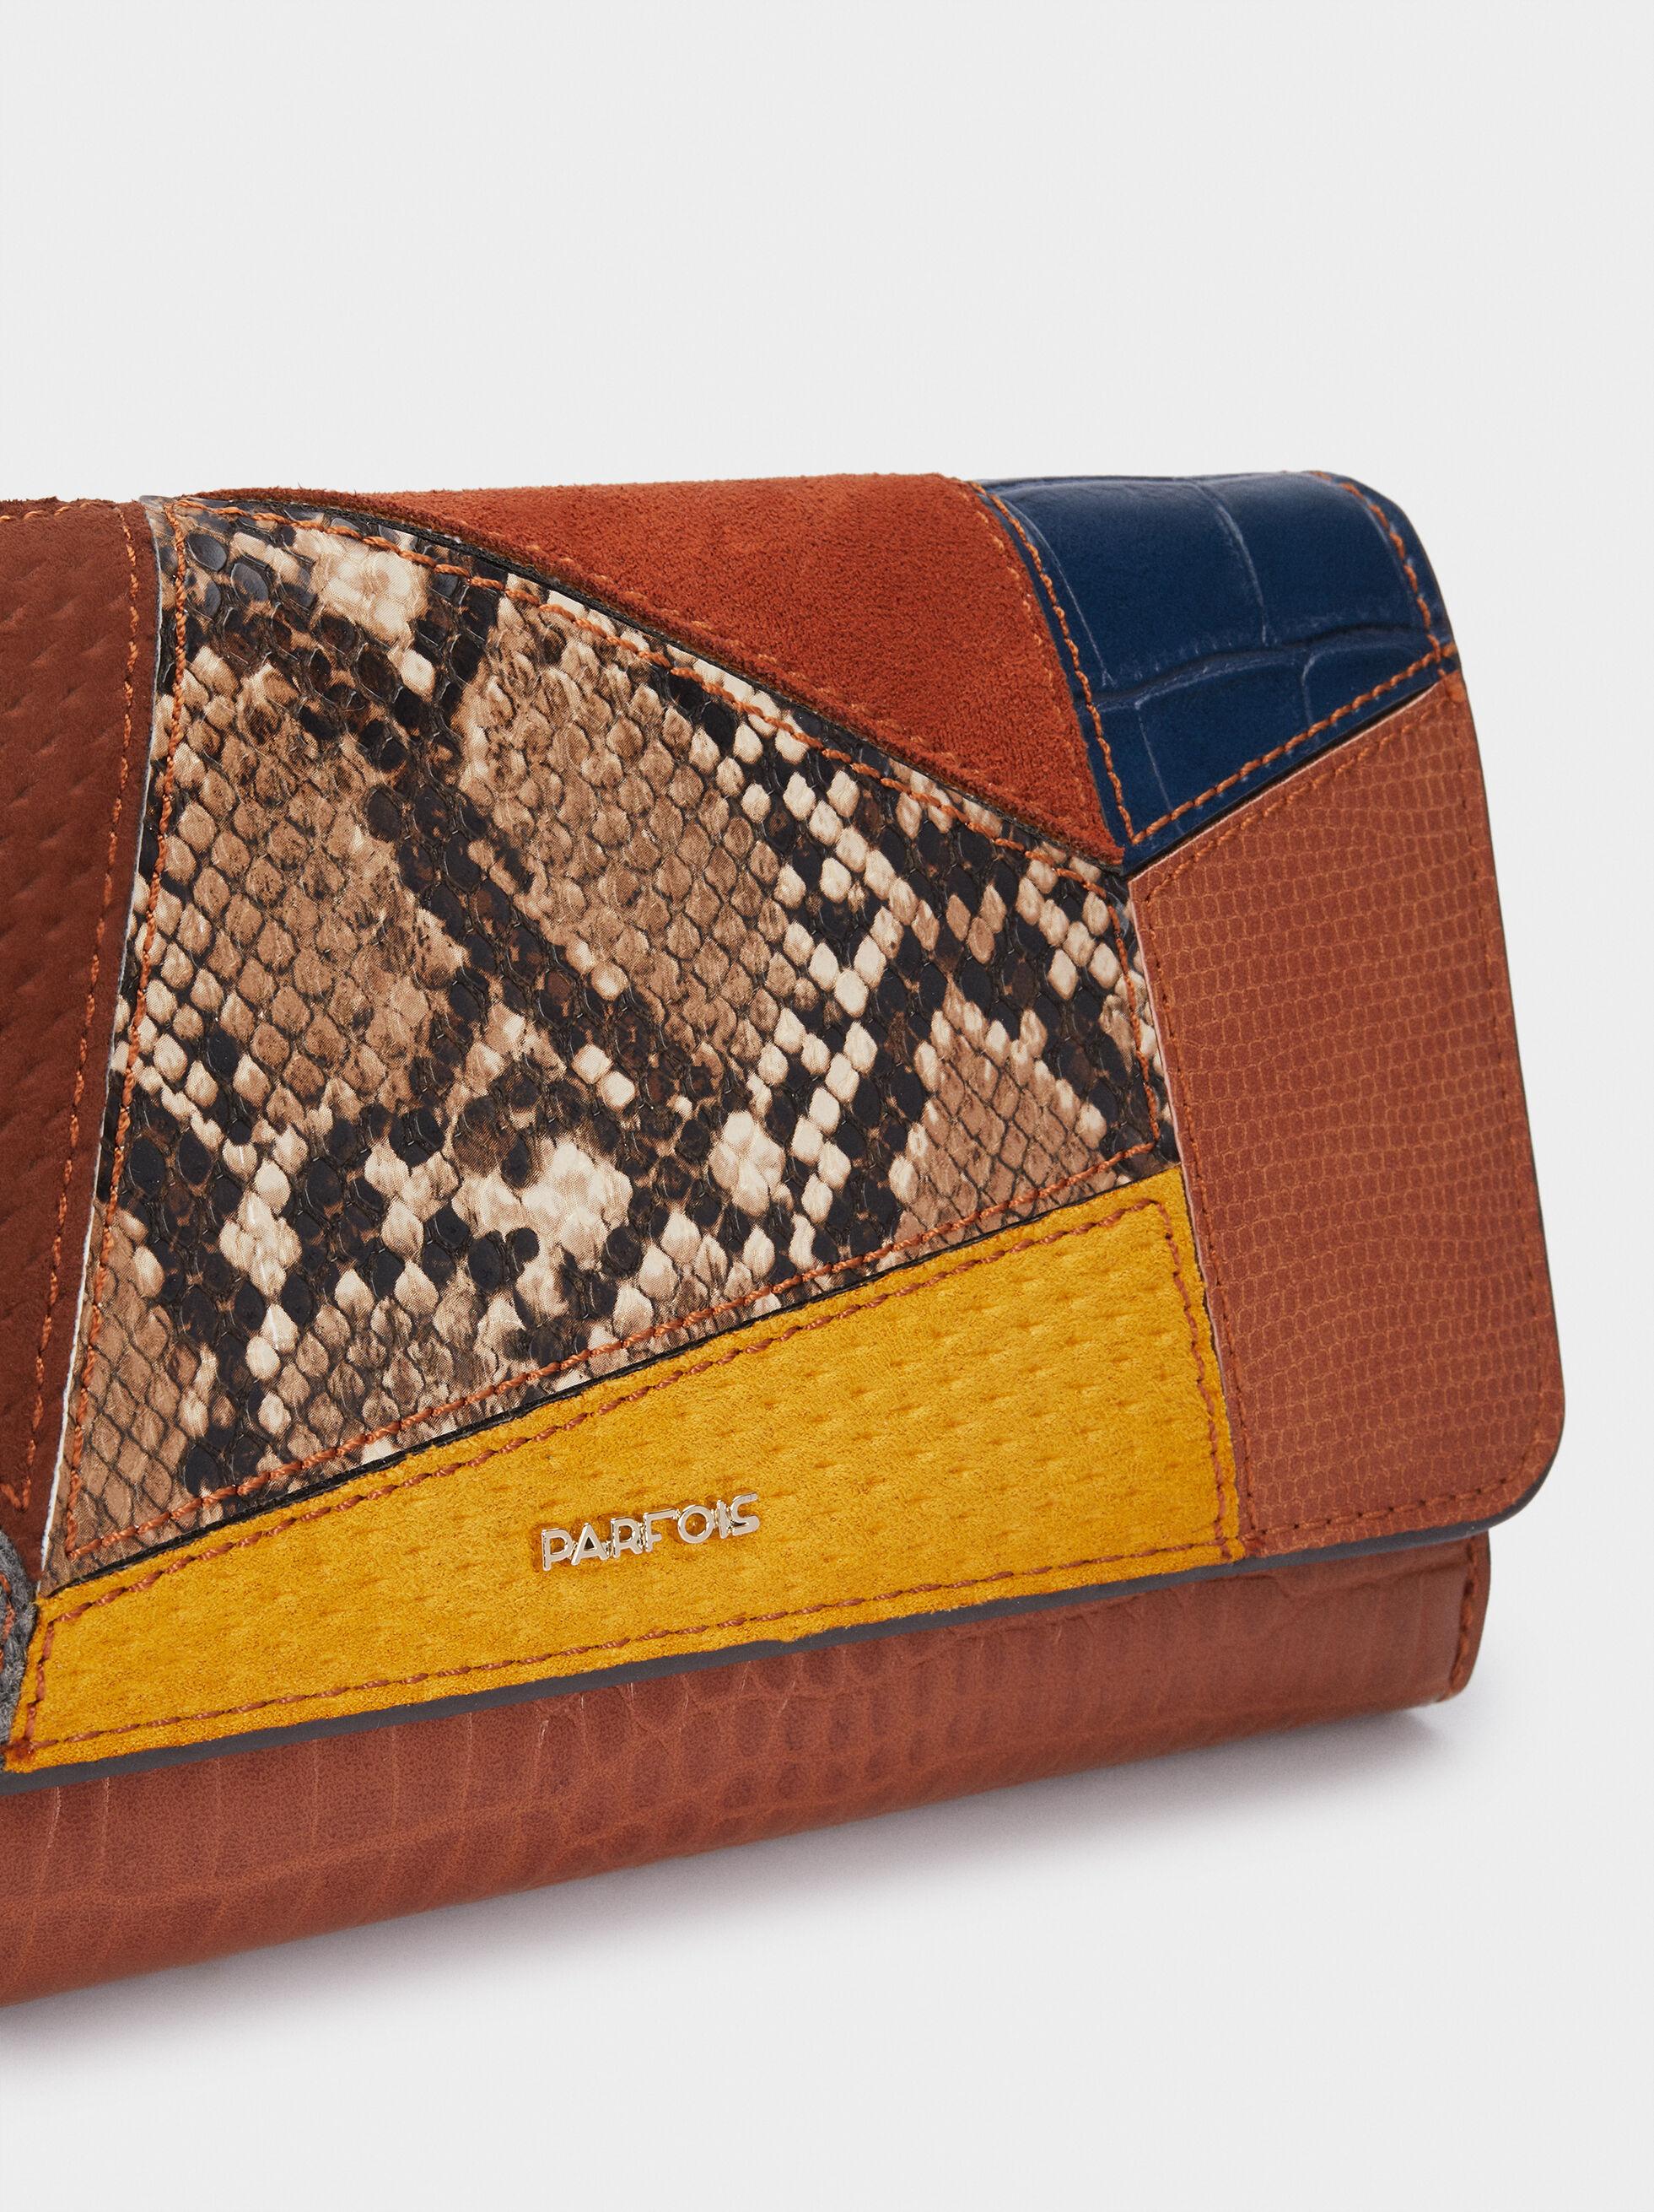 Patchwork Design Purse, Camel, hi-res